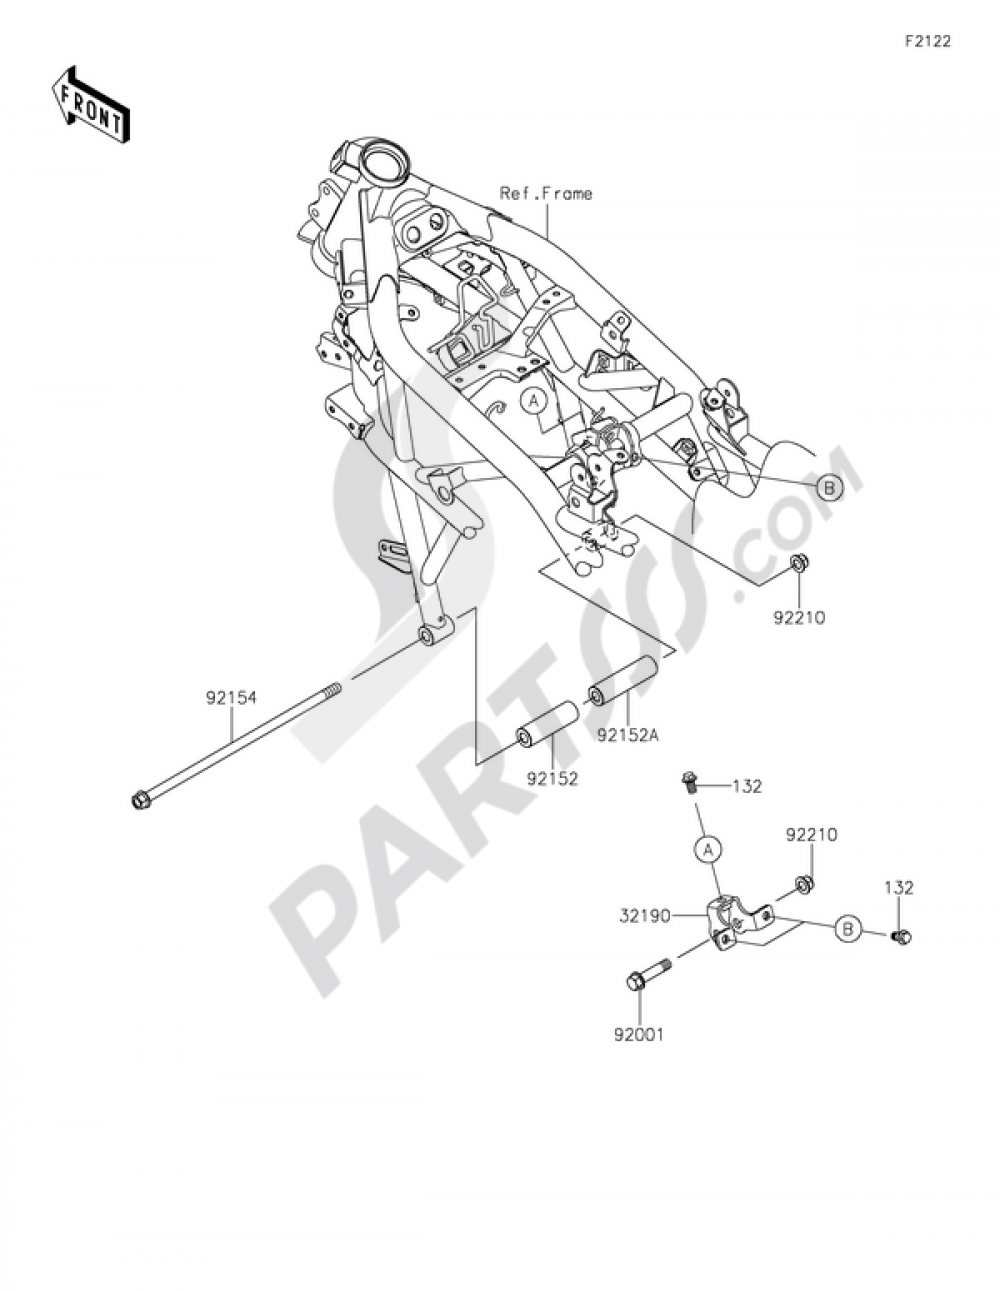 Engine Mount Kawasaki Ninja 250sl 2015 Mounting Diagrams